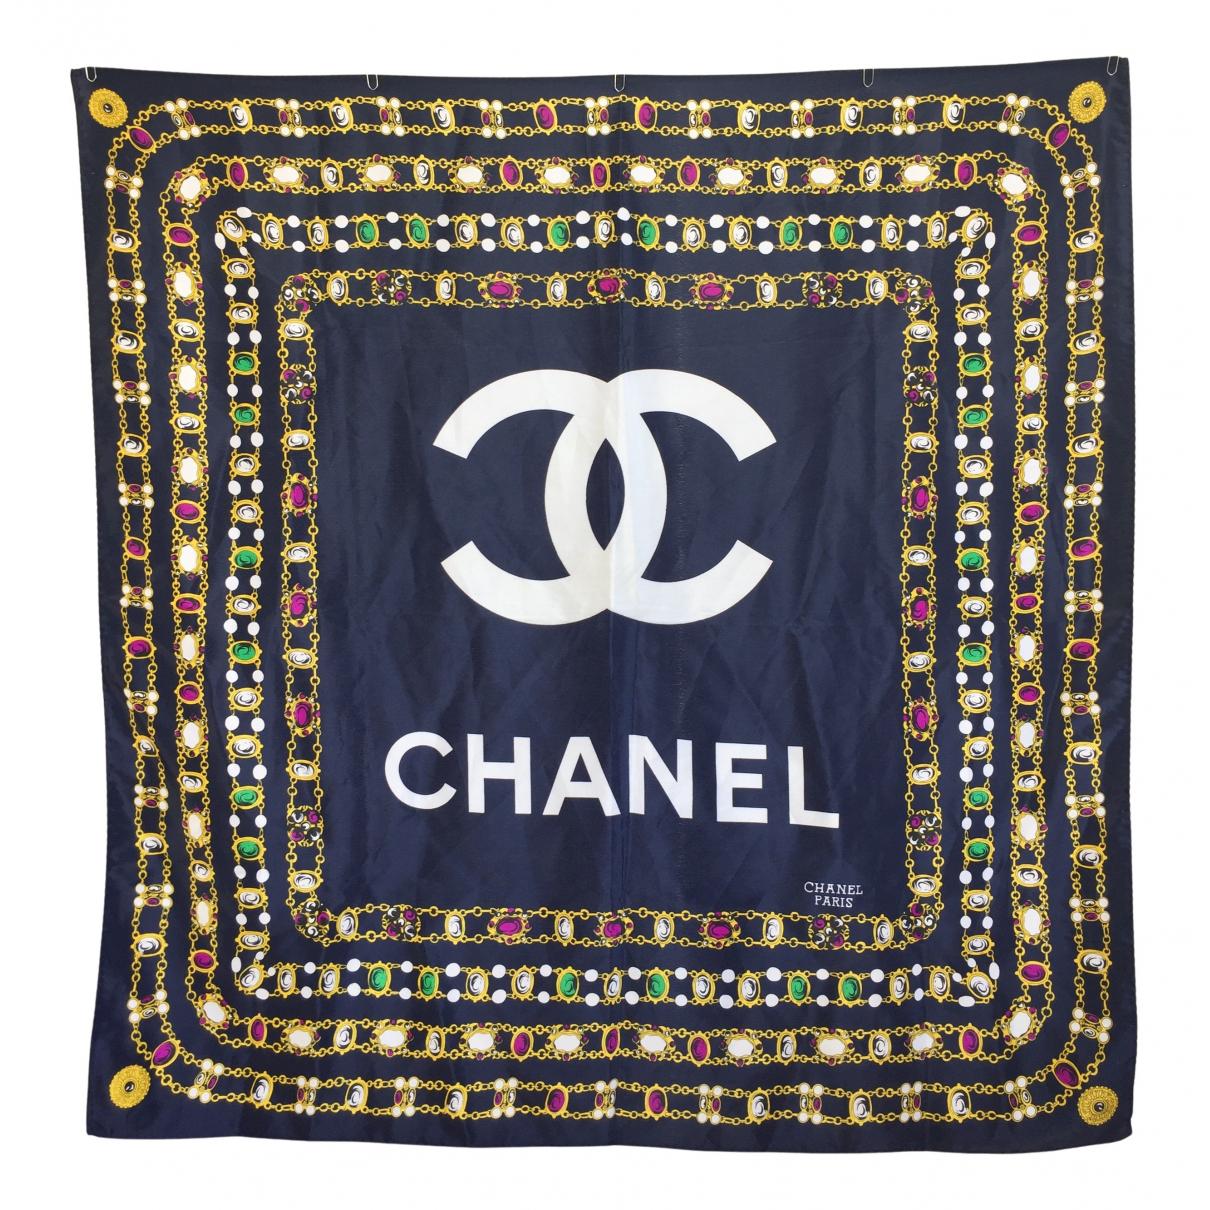 Chanel \N Schal in  Blau Polyester